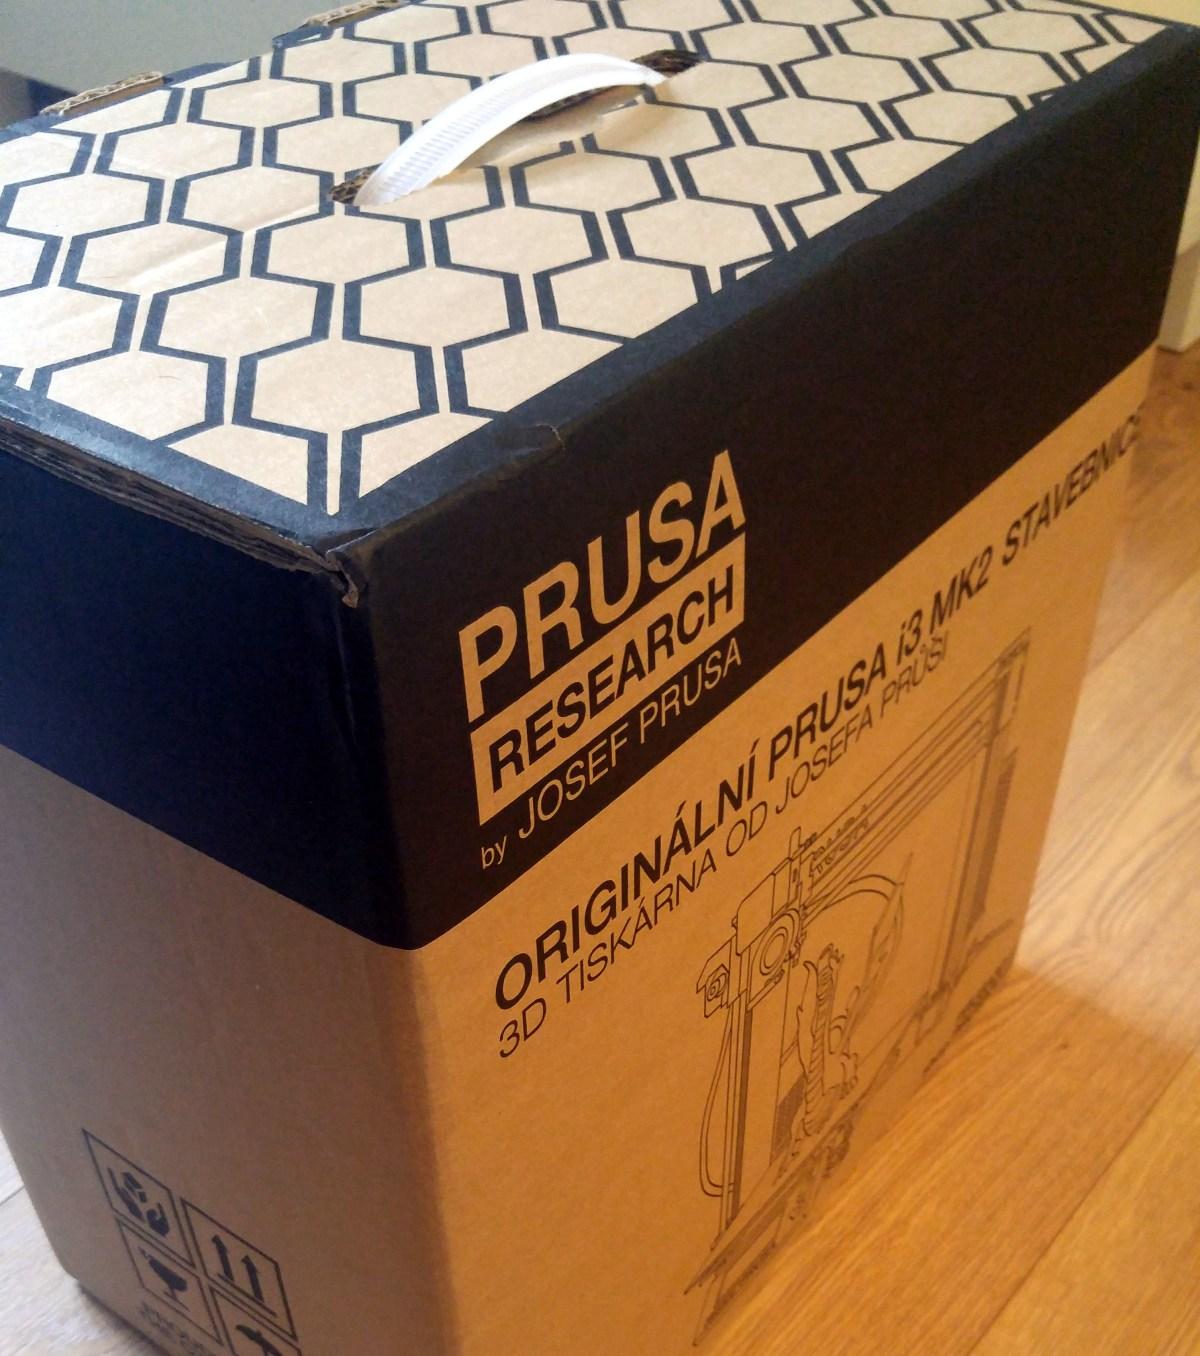 開箱文:Original Prusa i3 MK2S